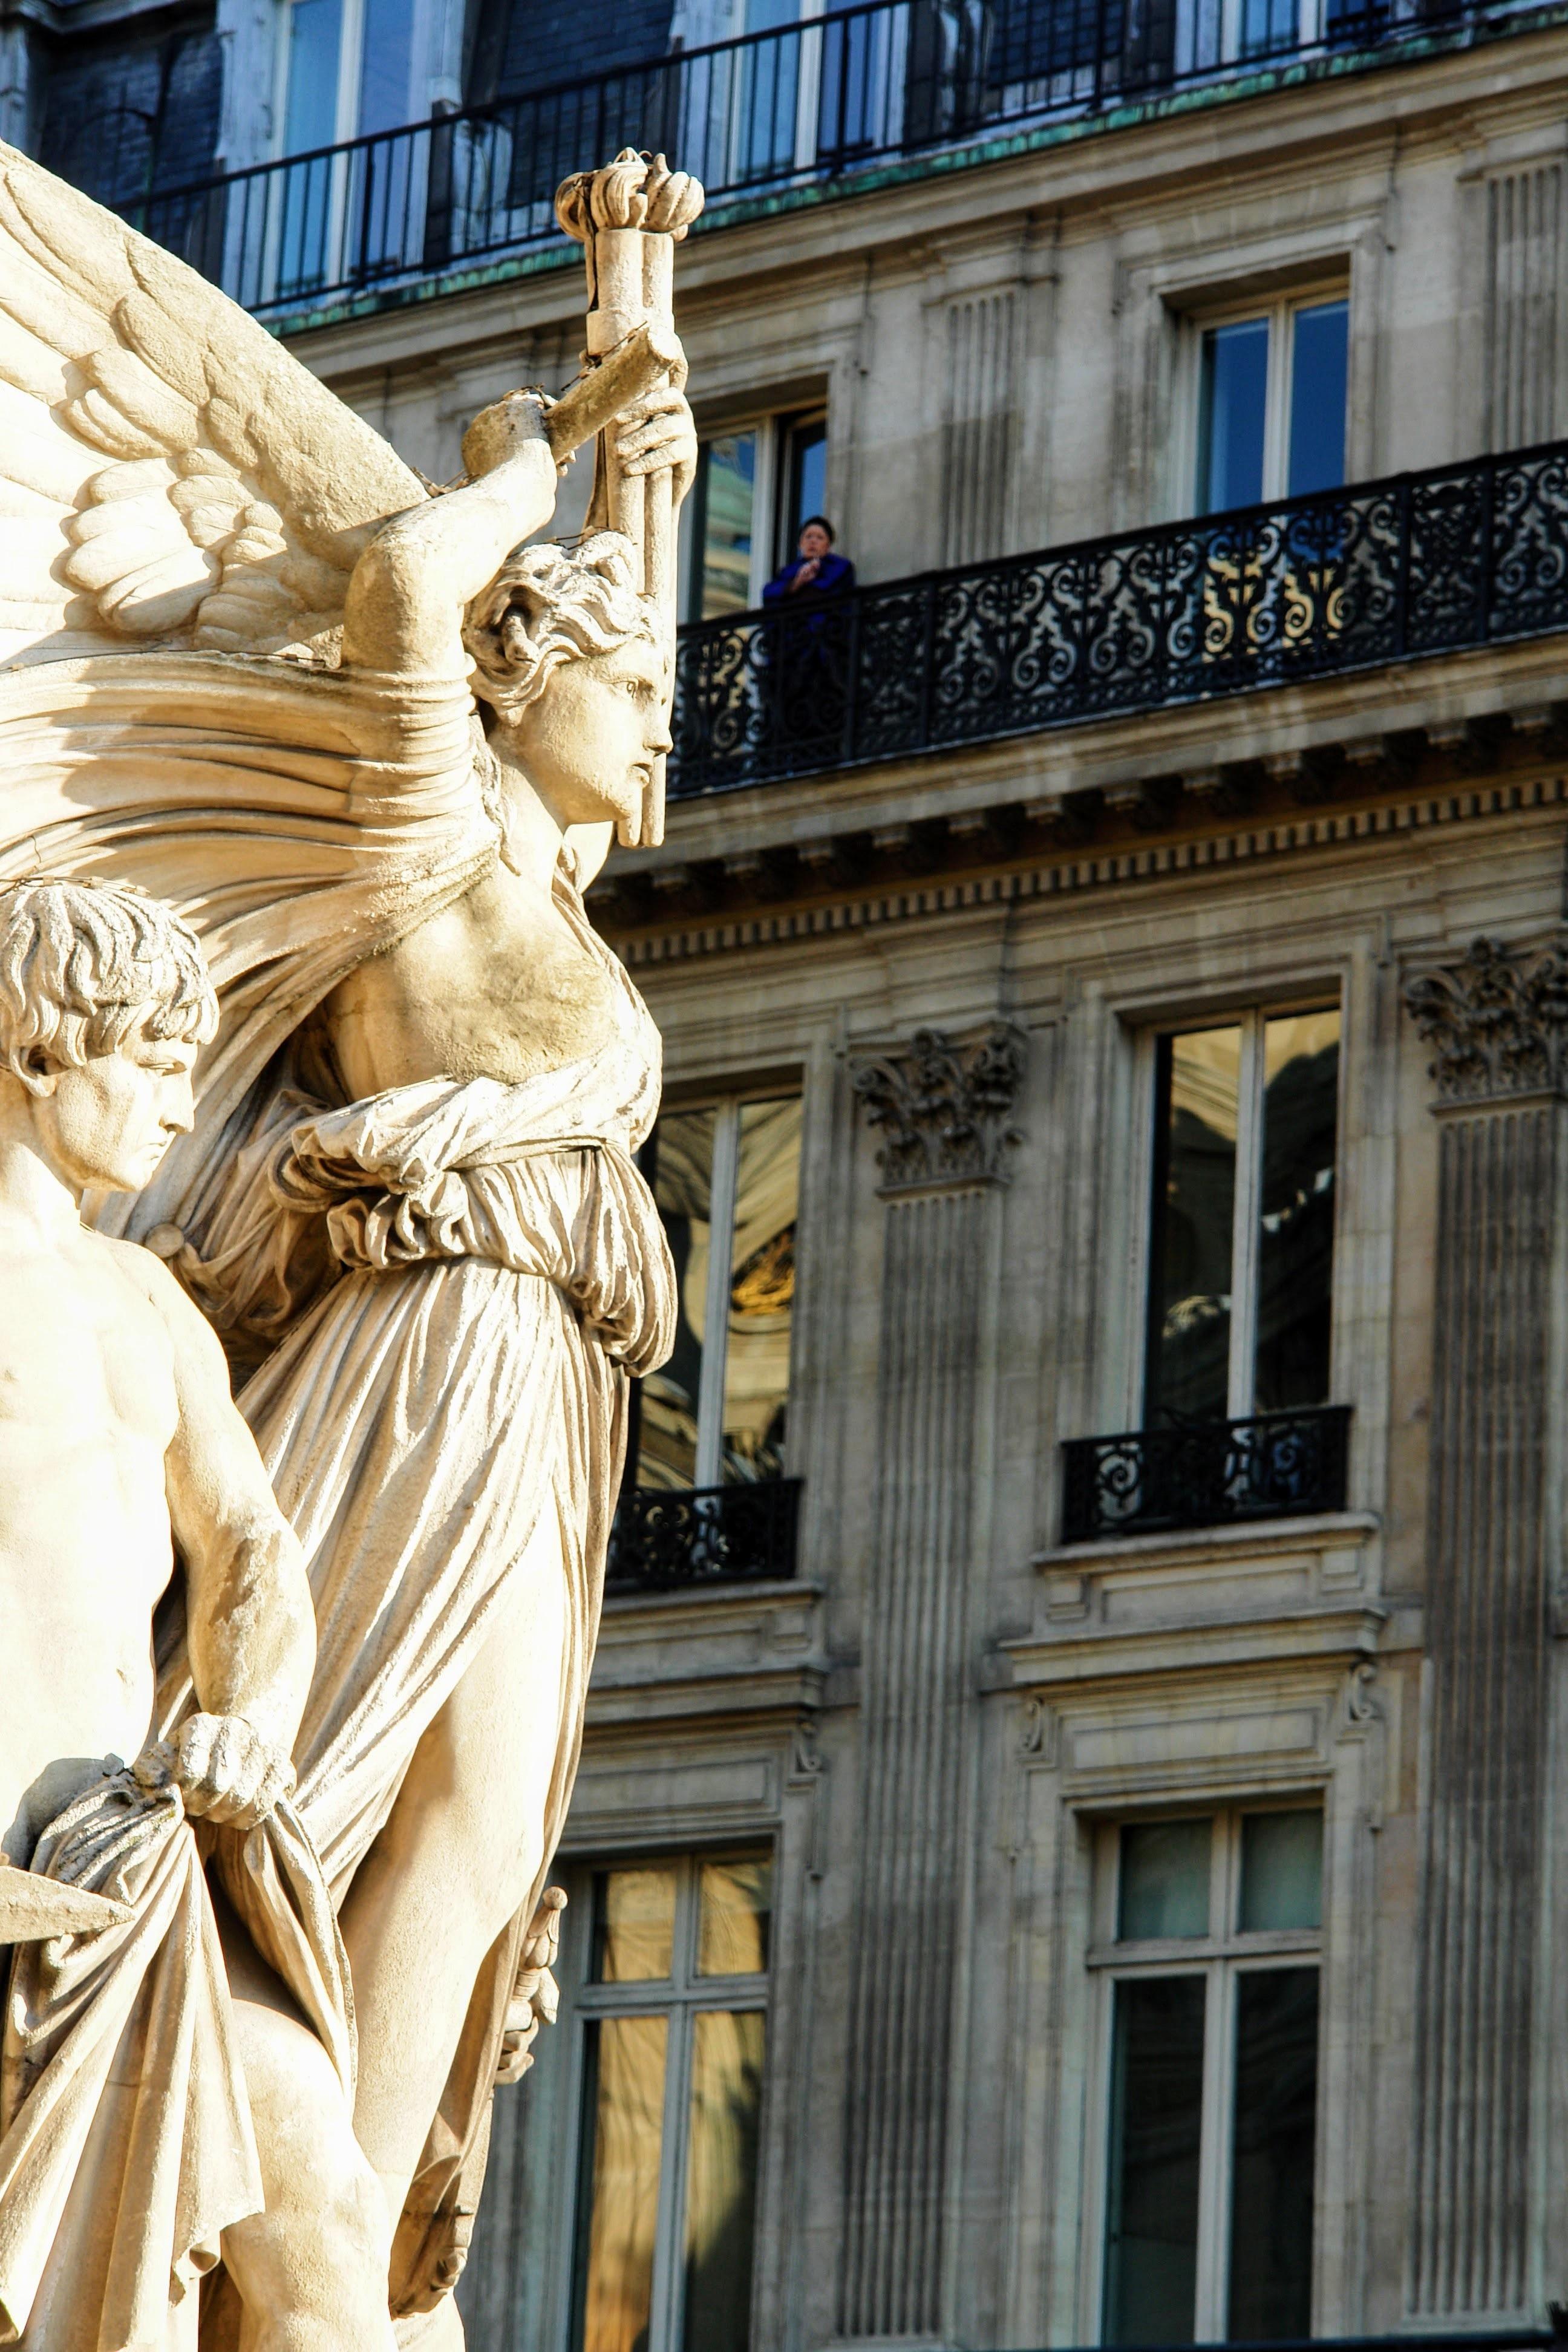 Fotos gratis rbol arquitectura edificio ciudad Art nouveau arquitectura